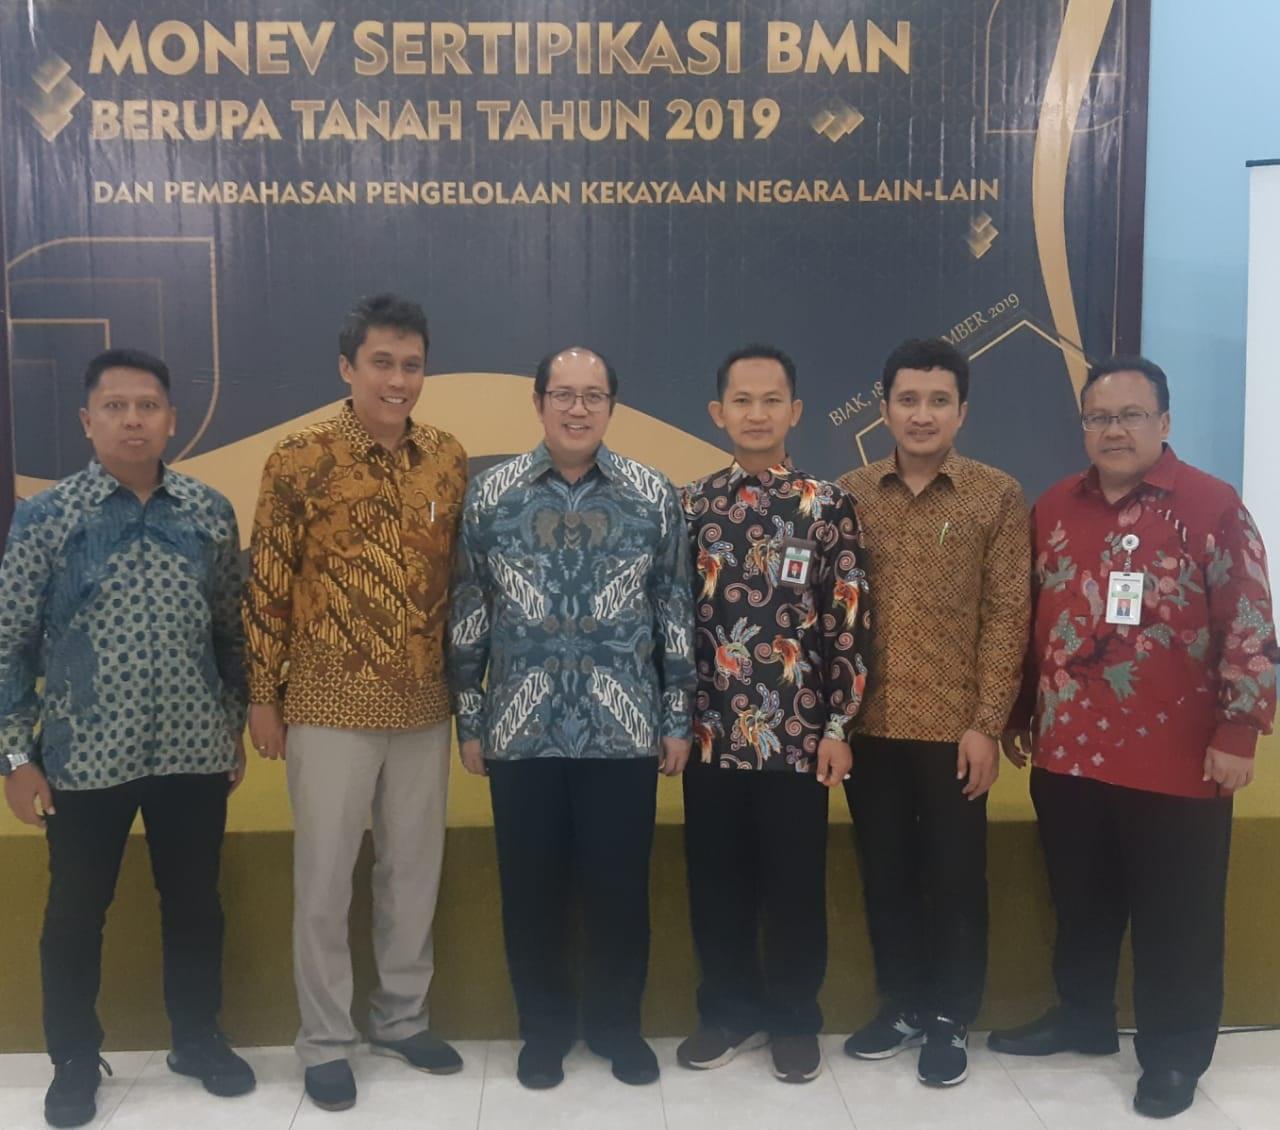 DARI UJUNG TIMUR INDONESIA DIRJEN KEKAYAAN NEGARA MENYERUKAN PERCEPATAN PENSERTIFIKASIAN BMN BERUPA TANAH